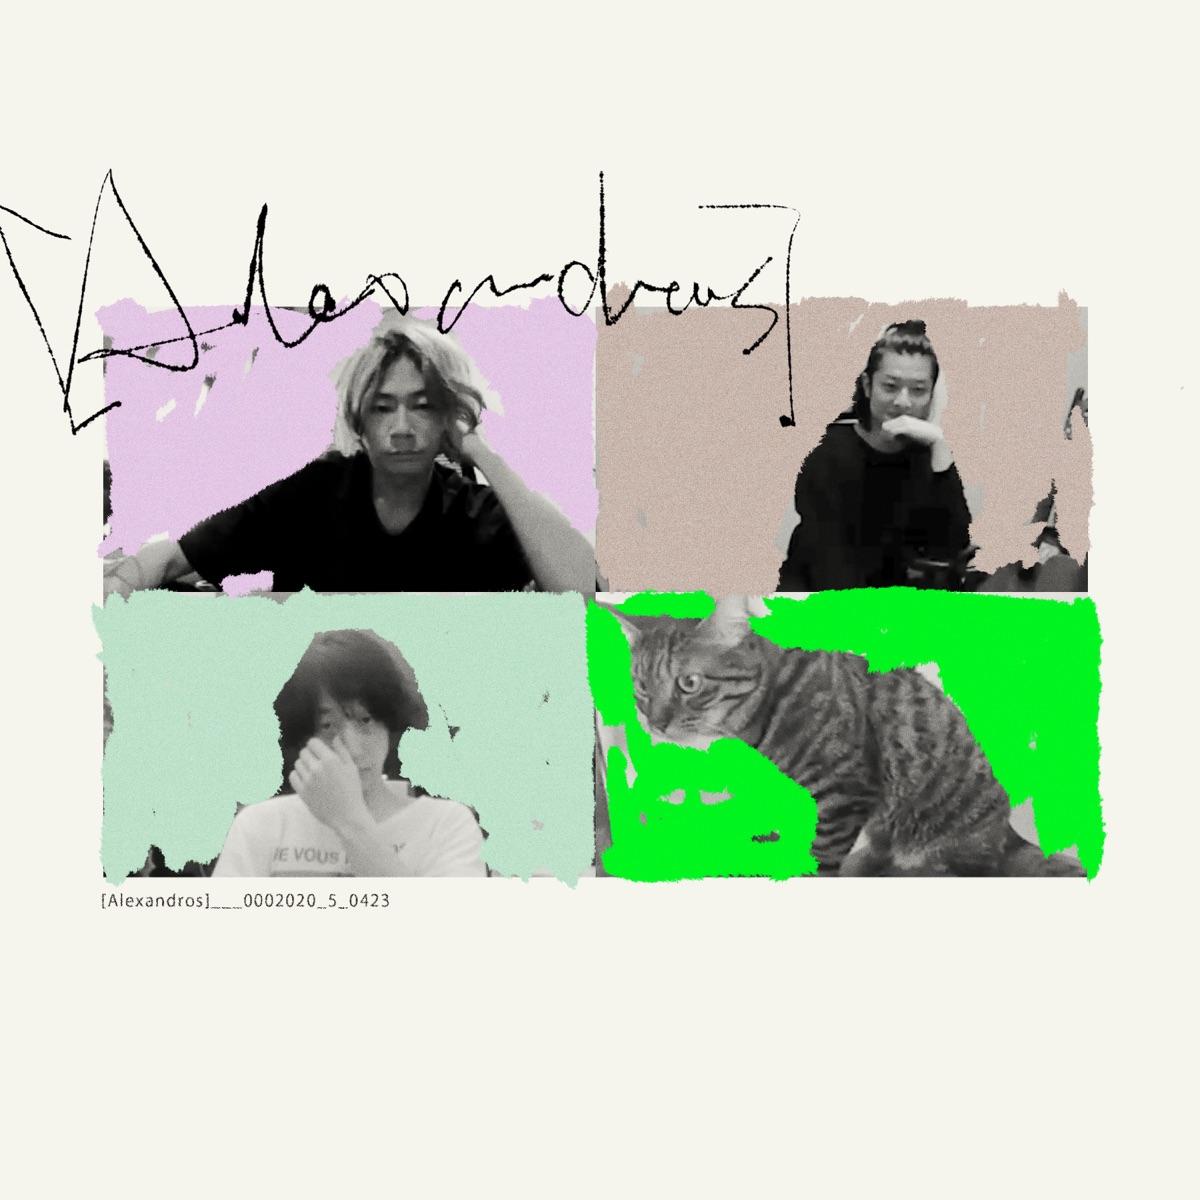 『[Alexandros] - city (feat. Pecori) 歌詞』収録の『Starrrrrrr (Bedroom ver.)』ジャケット